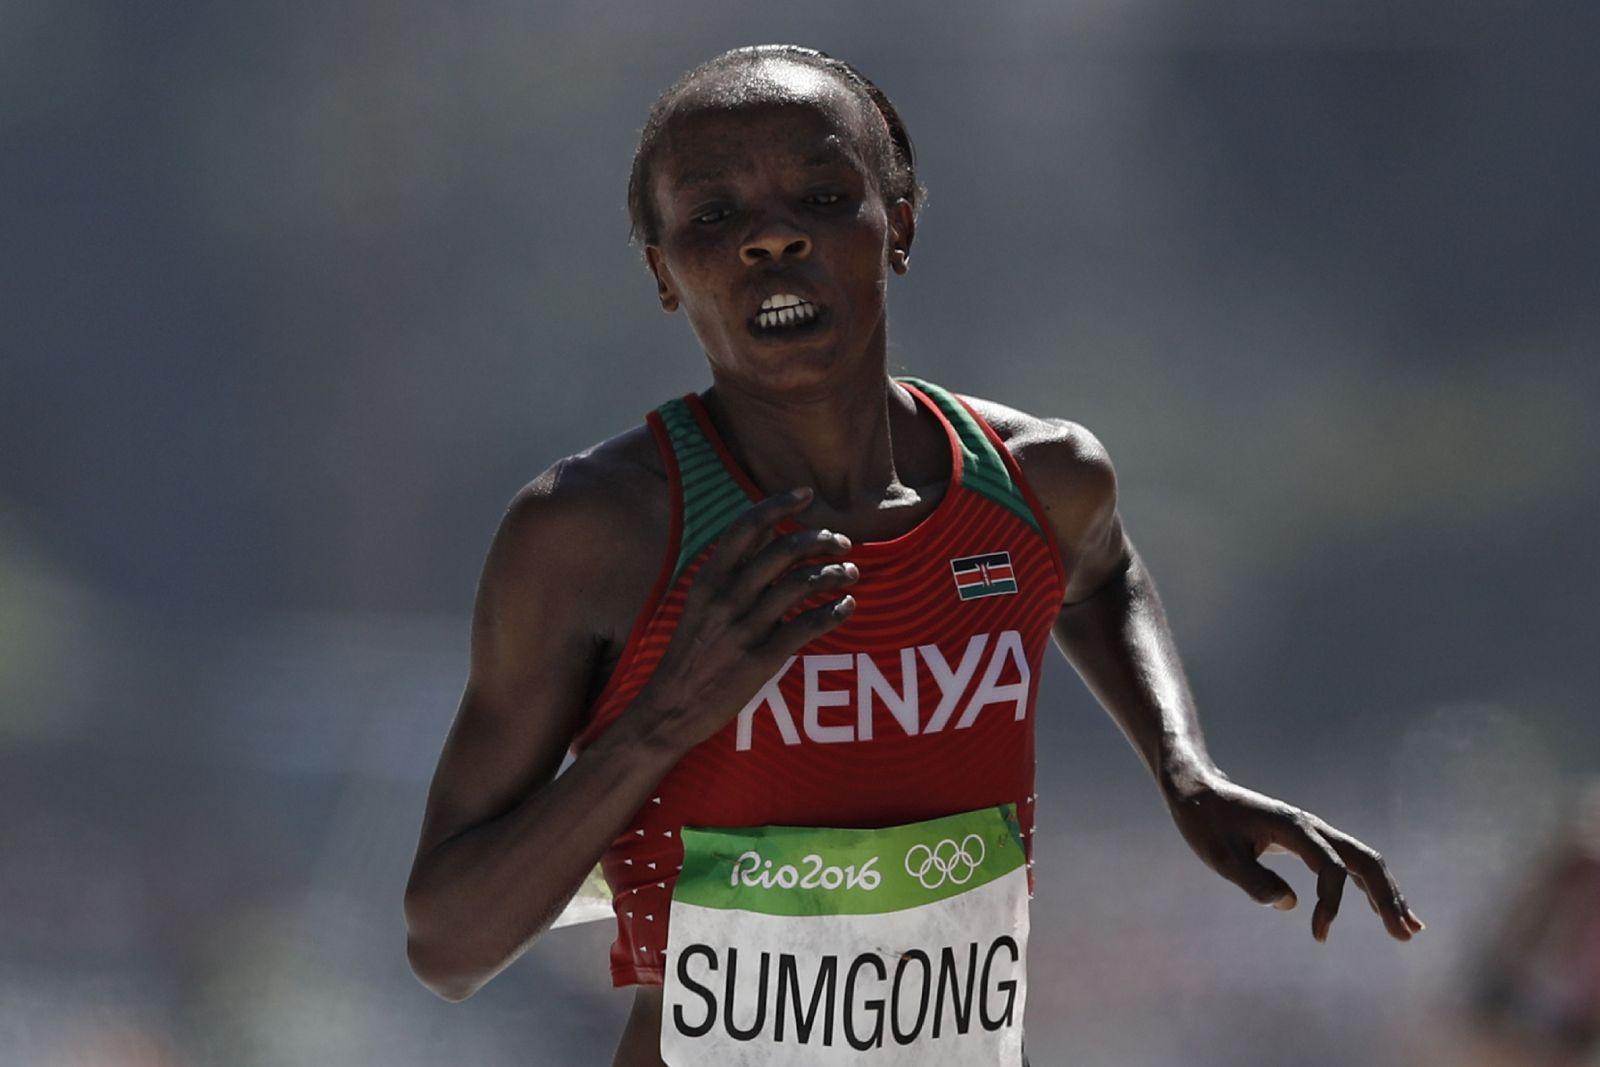 Jemima Sumgong Marathon